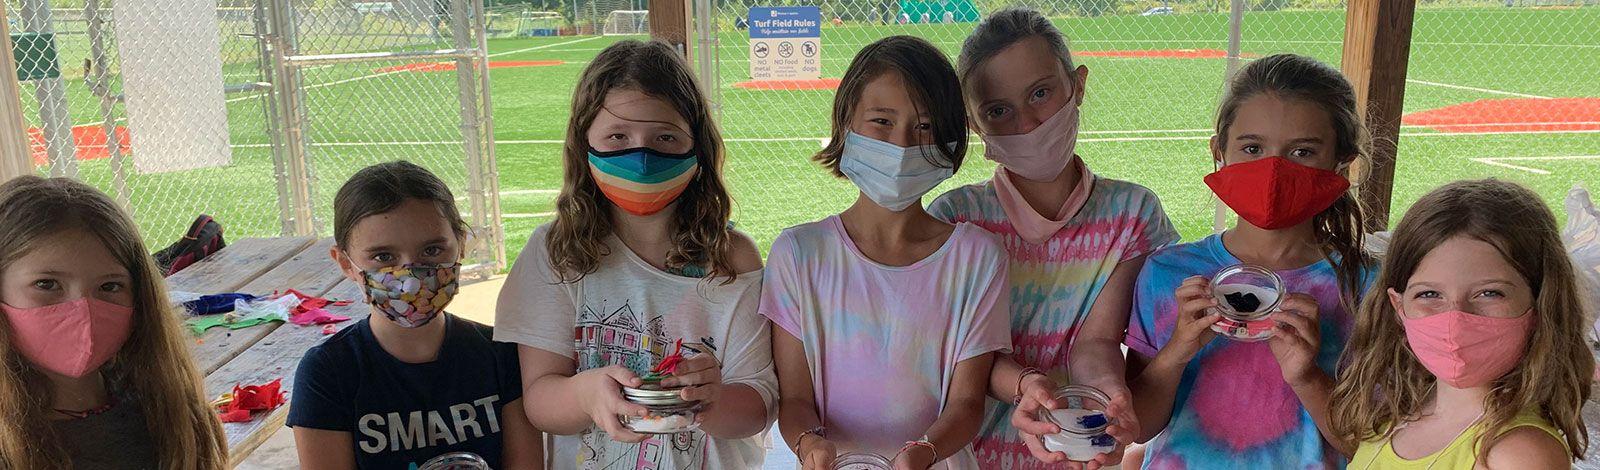 Girls having fun at Hyman Brand Hebrew Academy